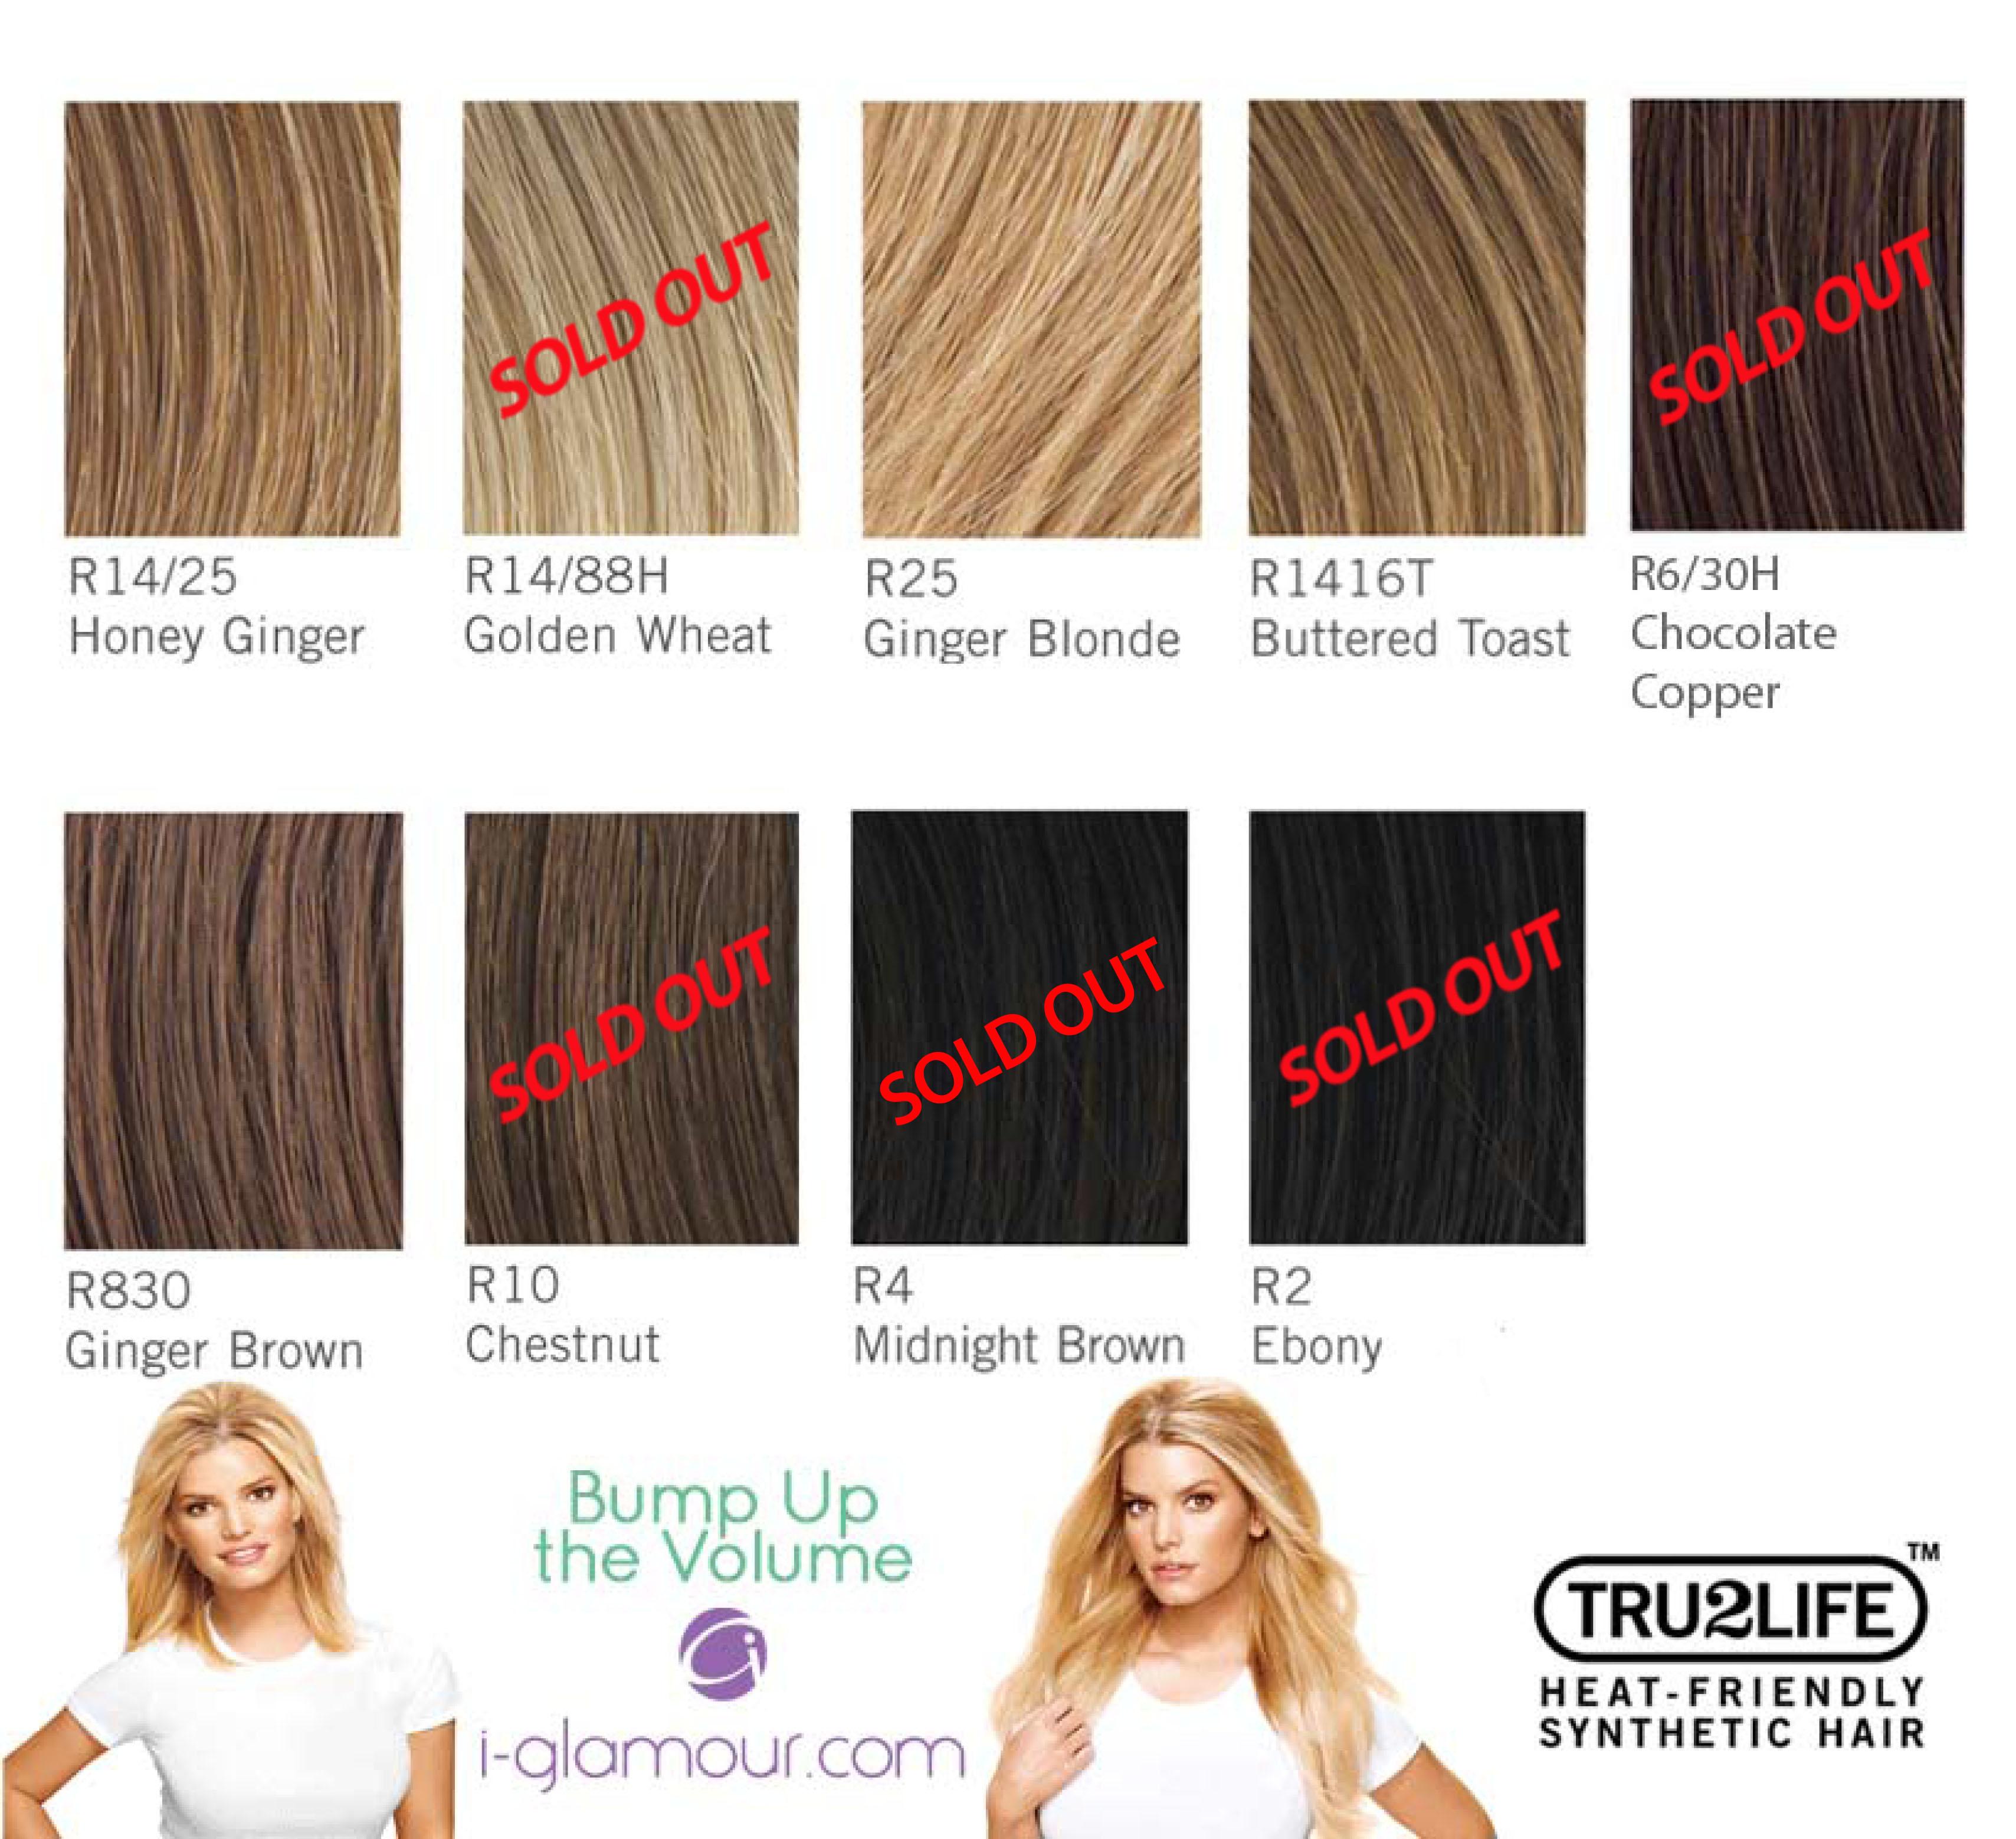 Hairdo Jessica Simpsons Tru2life Bump Up The Volume Mid Length Hair